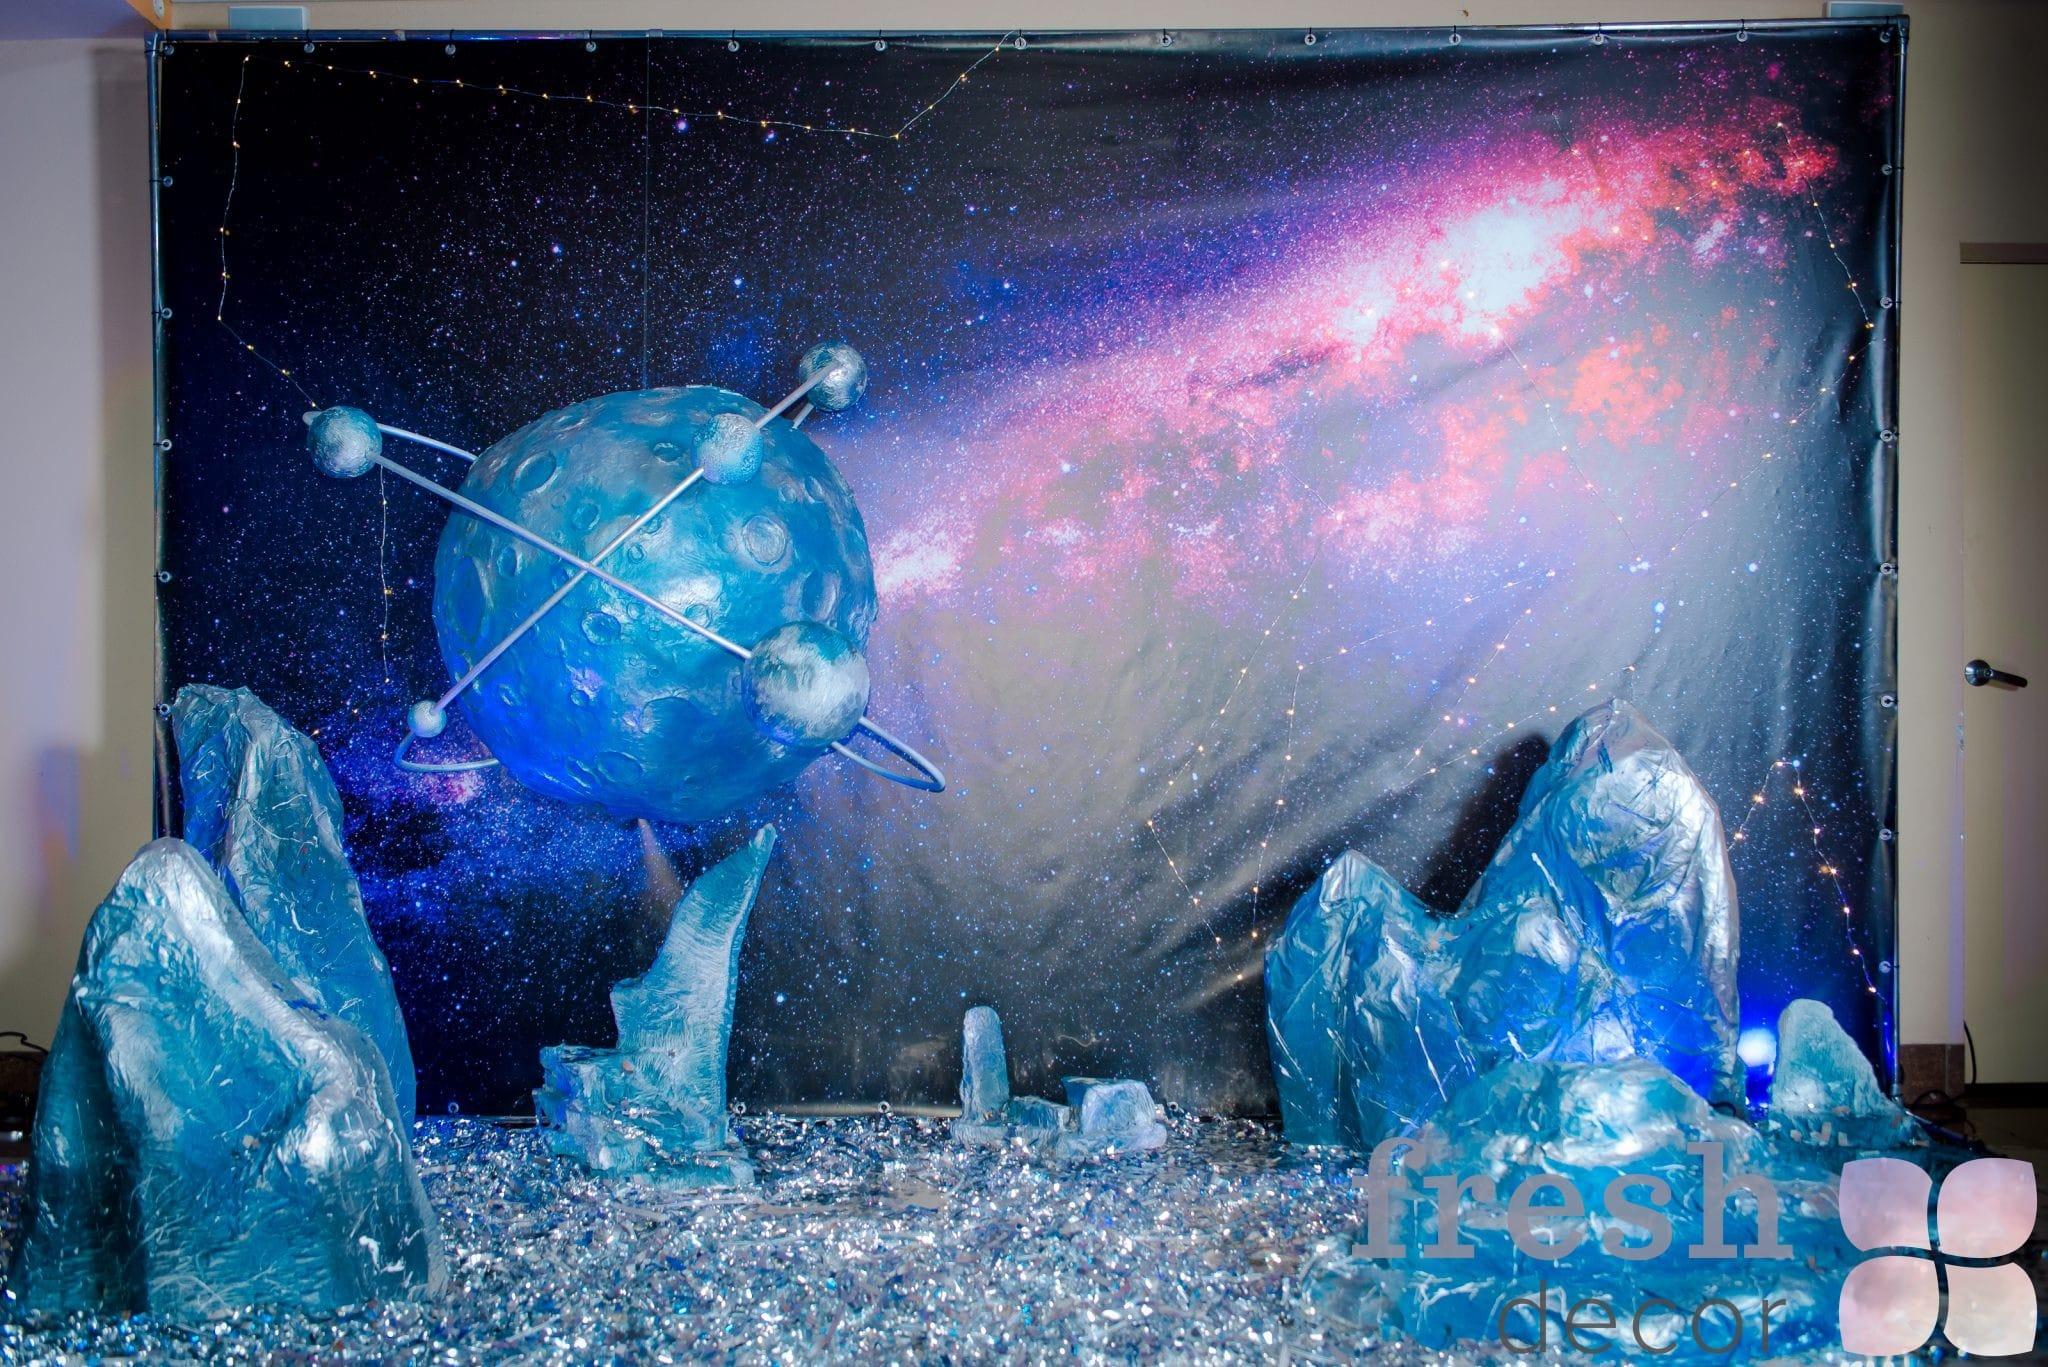 fotozona Cosmos 2